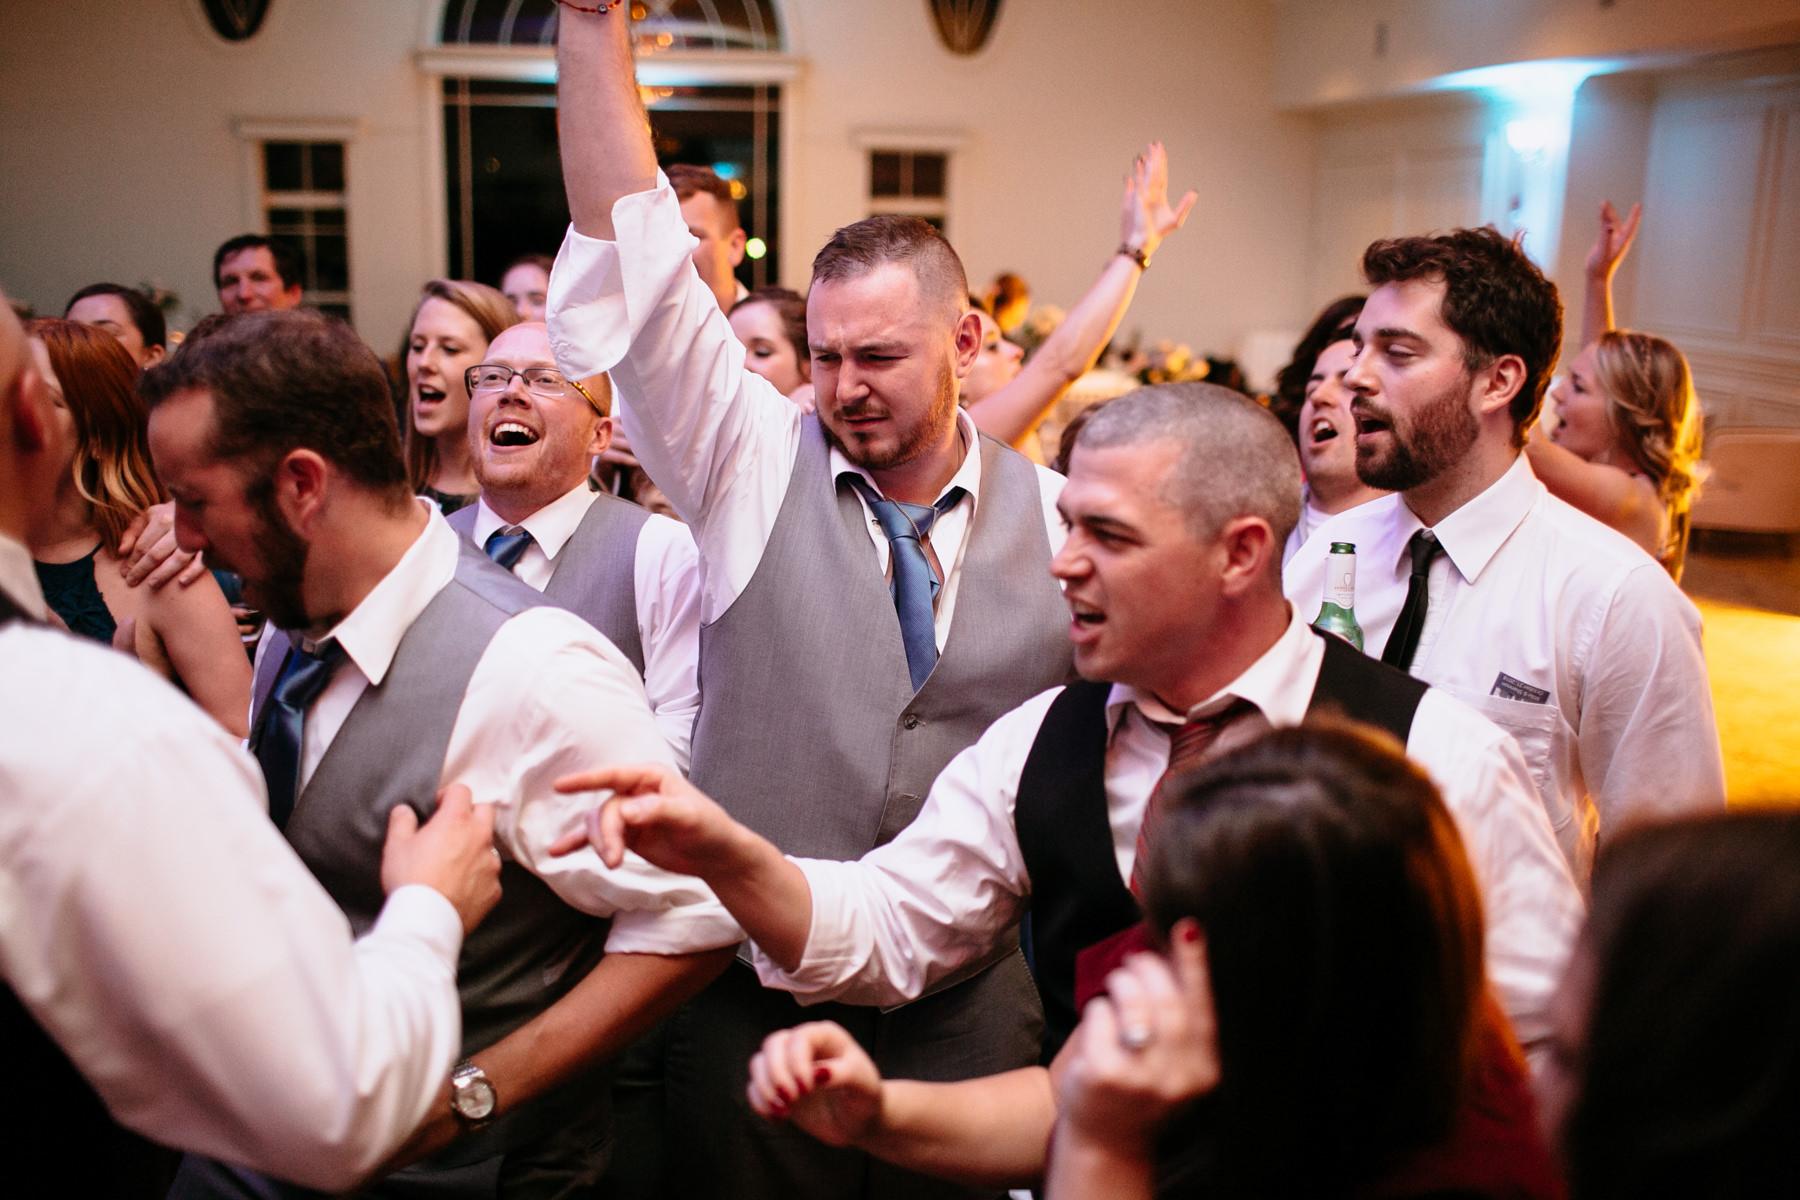 Quincy Ma Massachusetts Wedding Dedham Boston Granie Links Wedding New England Catholic Cathedral Liz Osban Photography 139.jpg